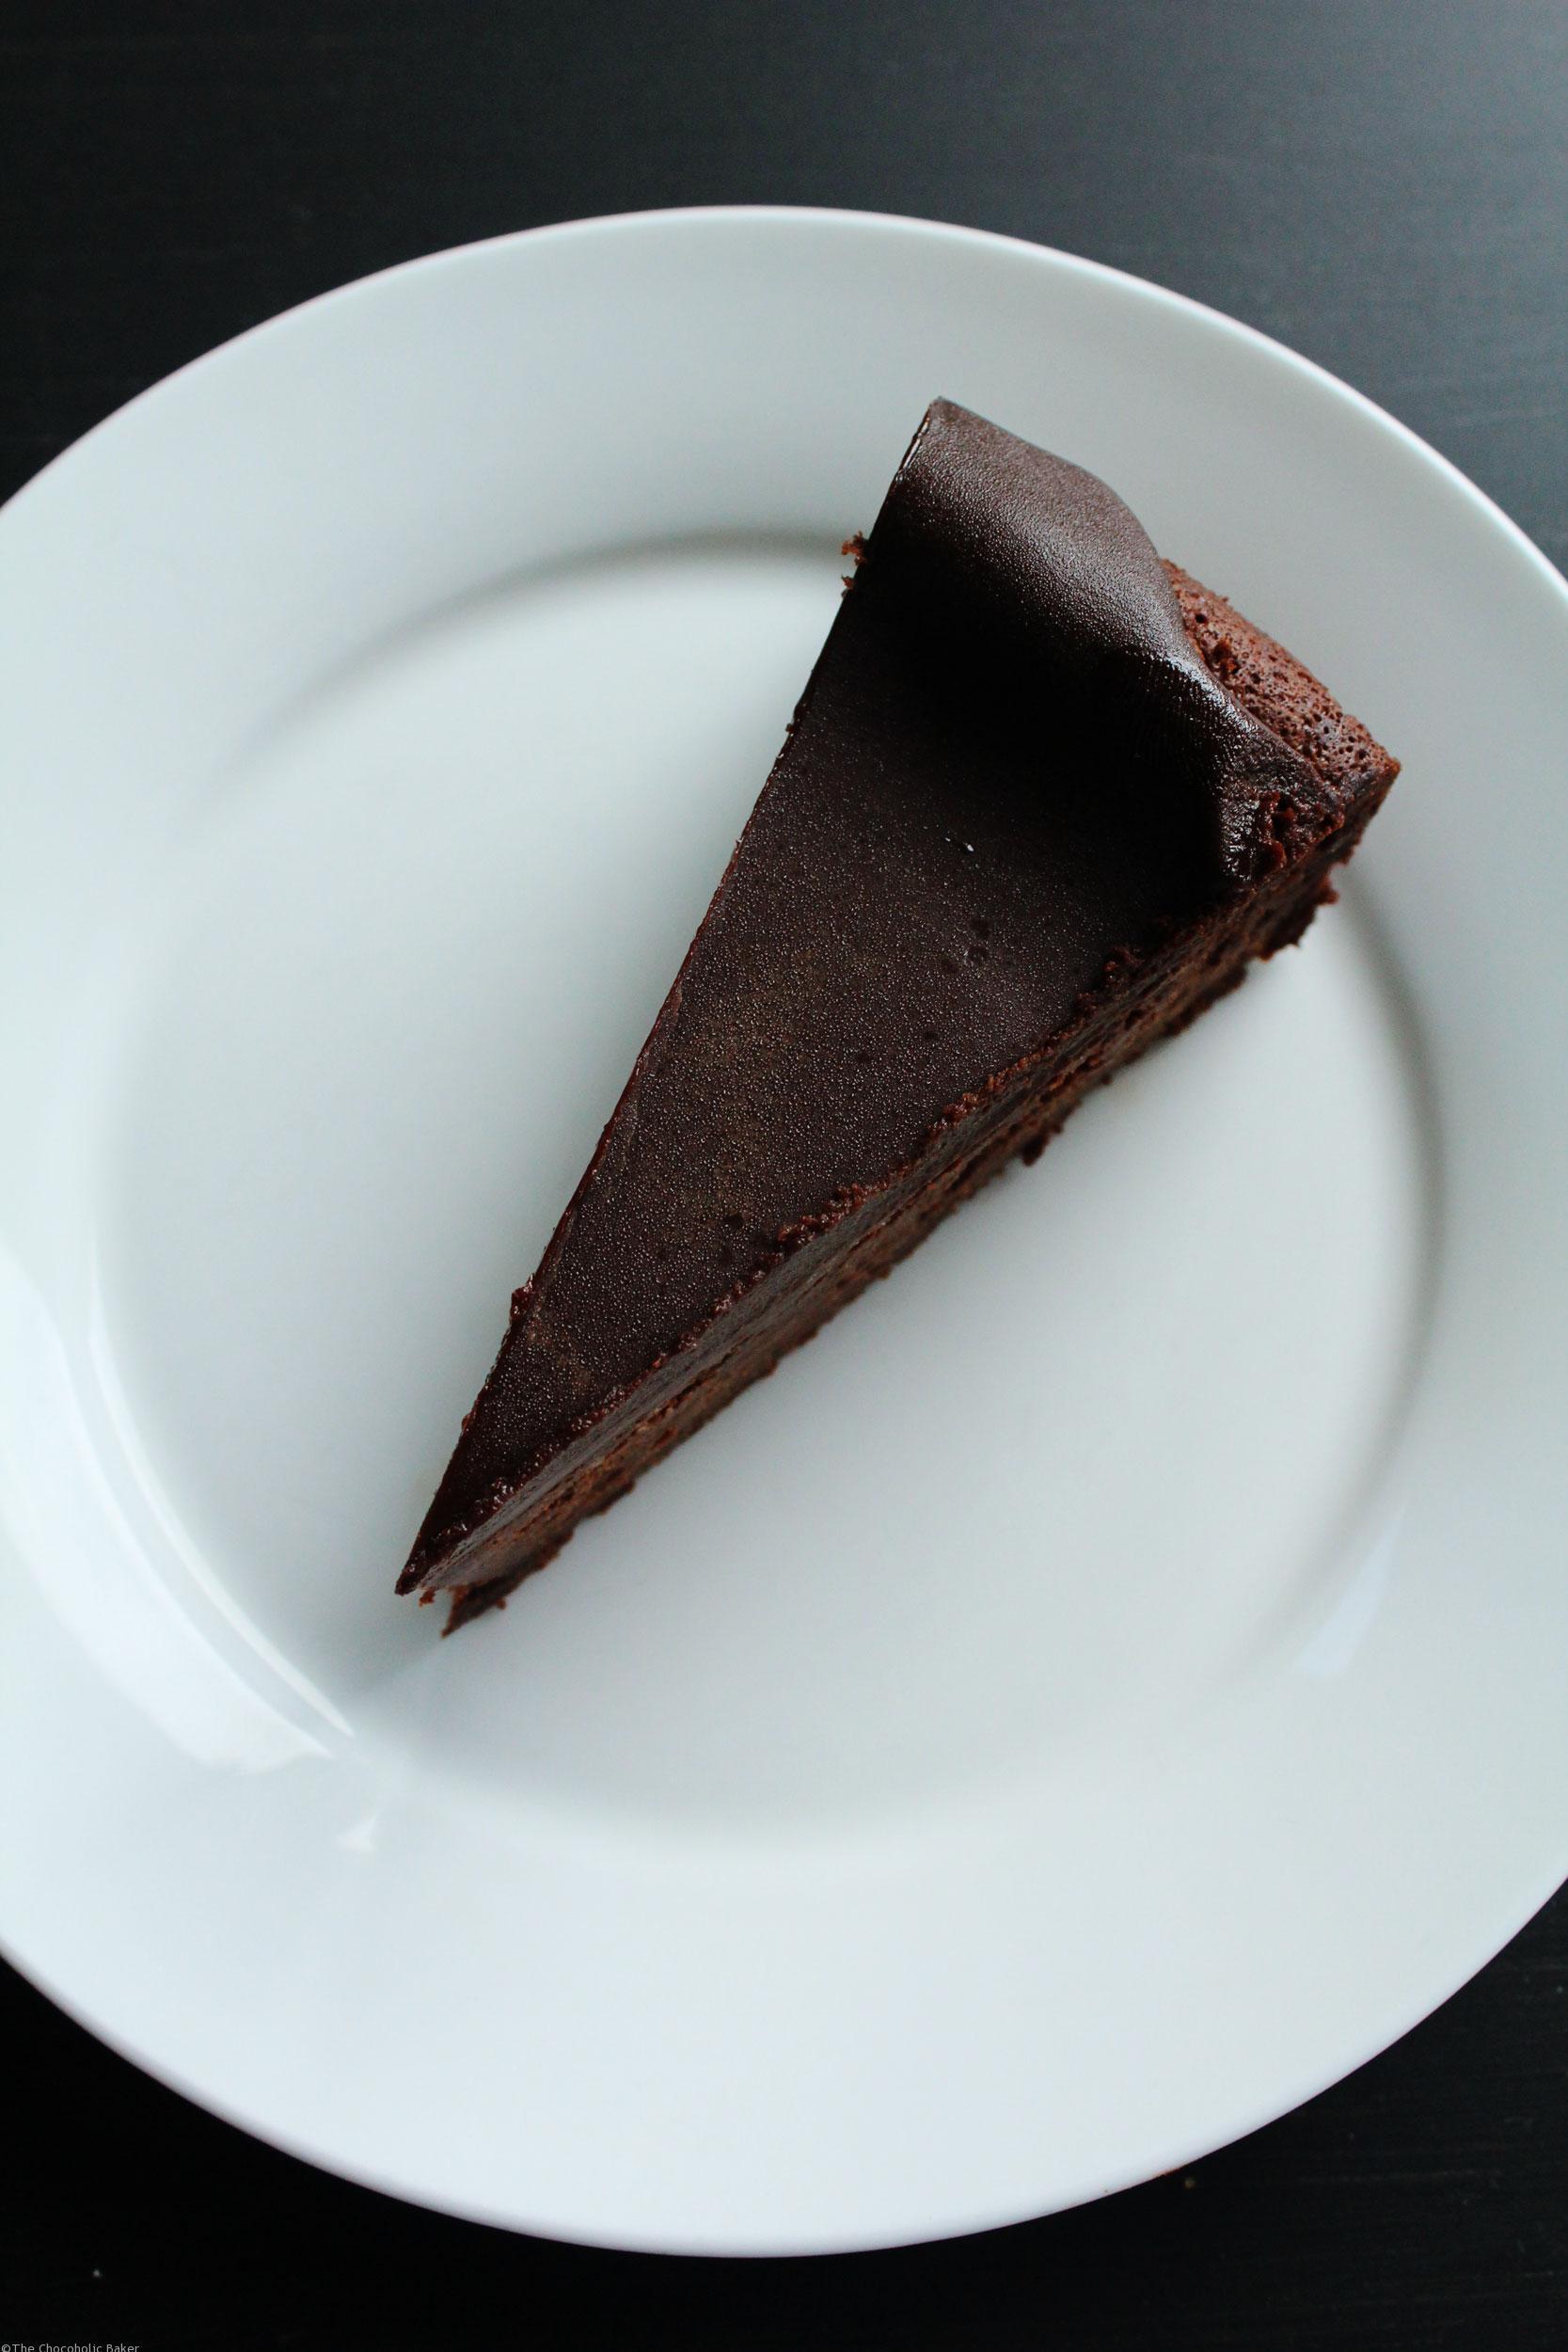 Dense Gluten Free Chocolate Cake - The Chocoholic Baker